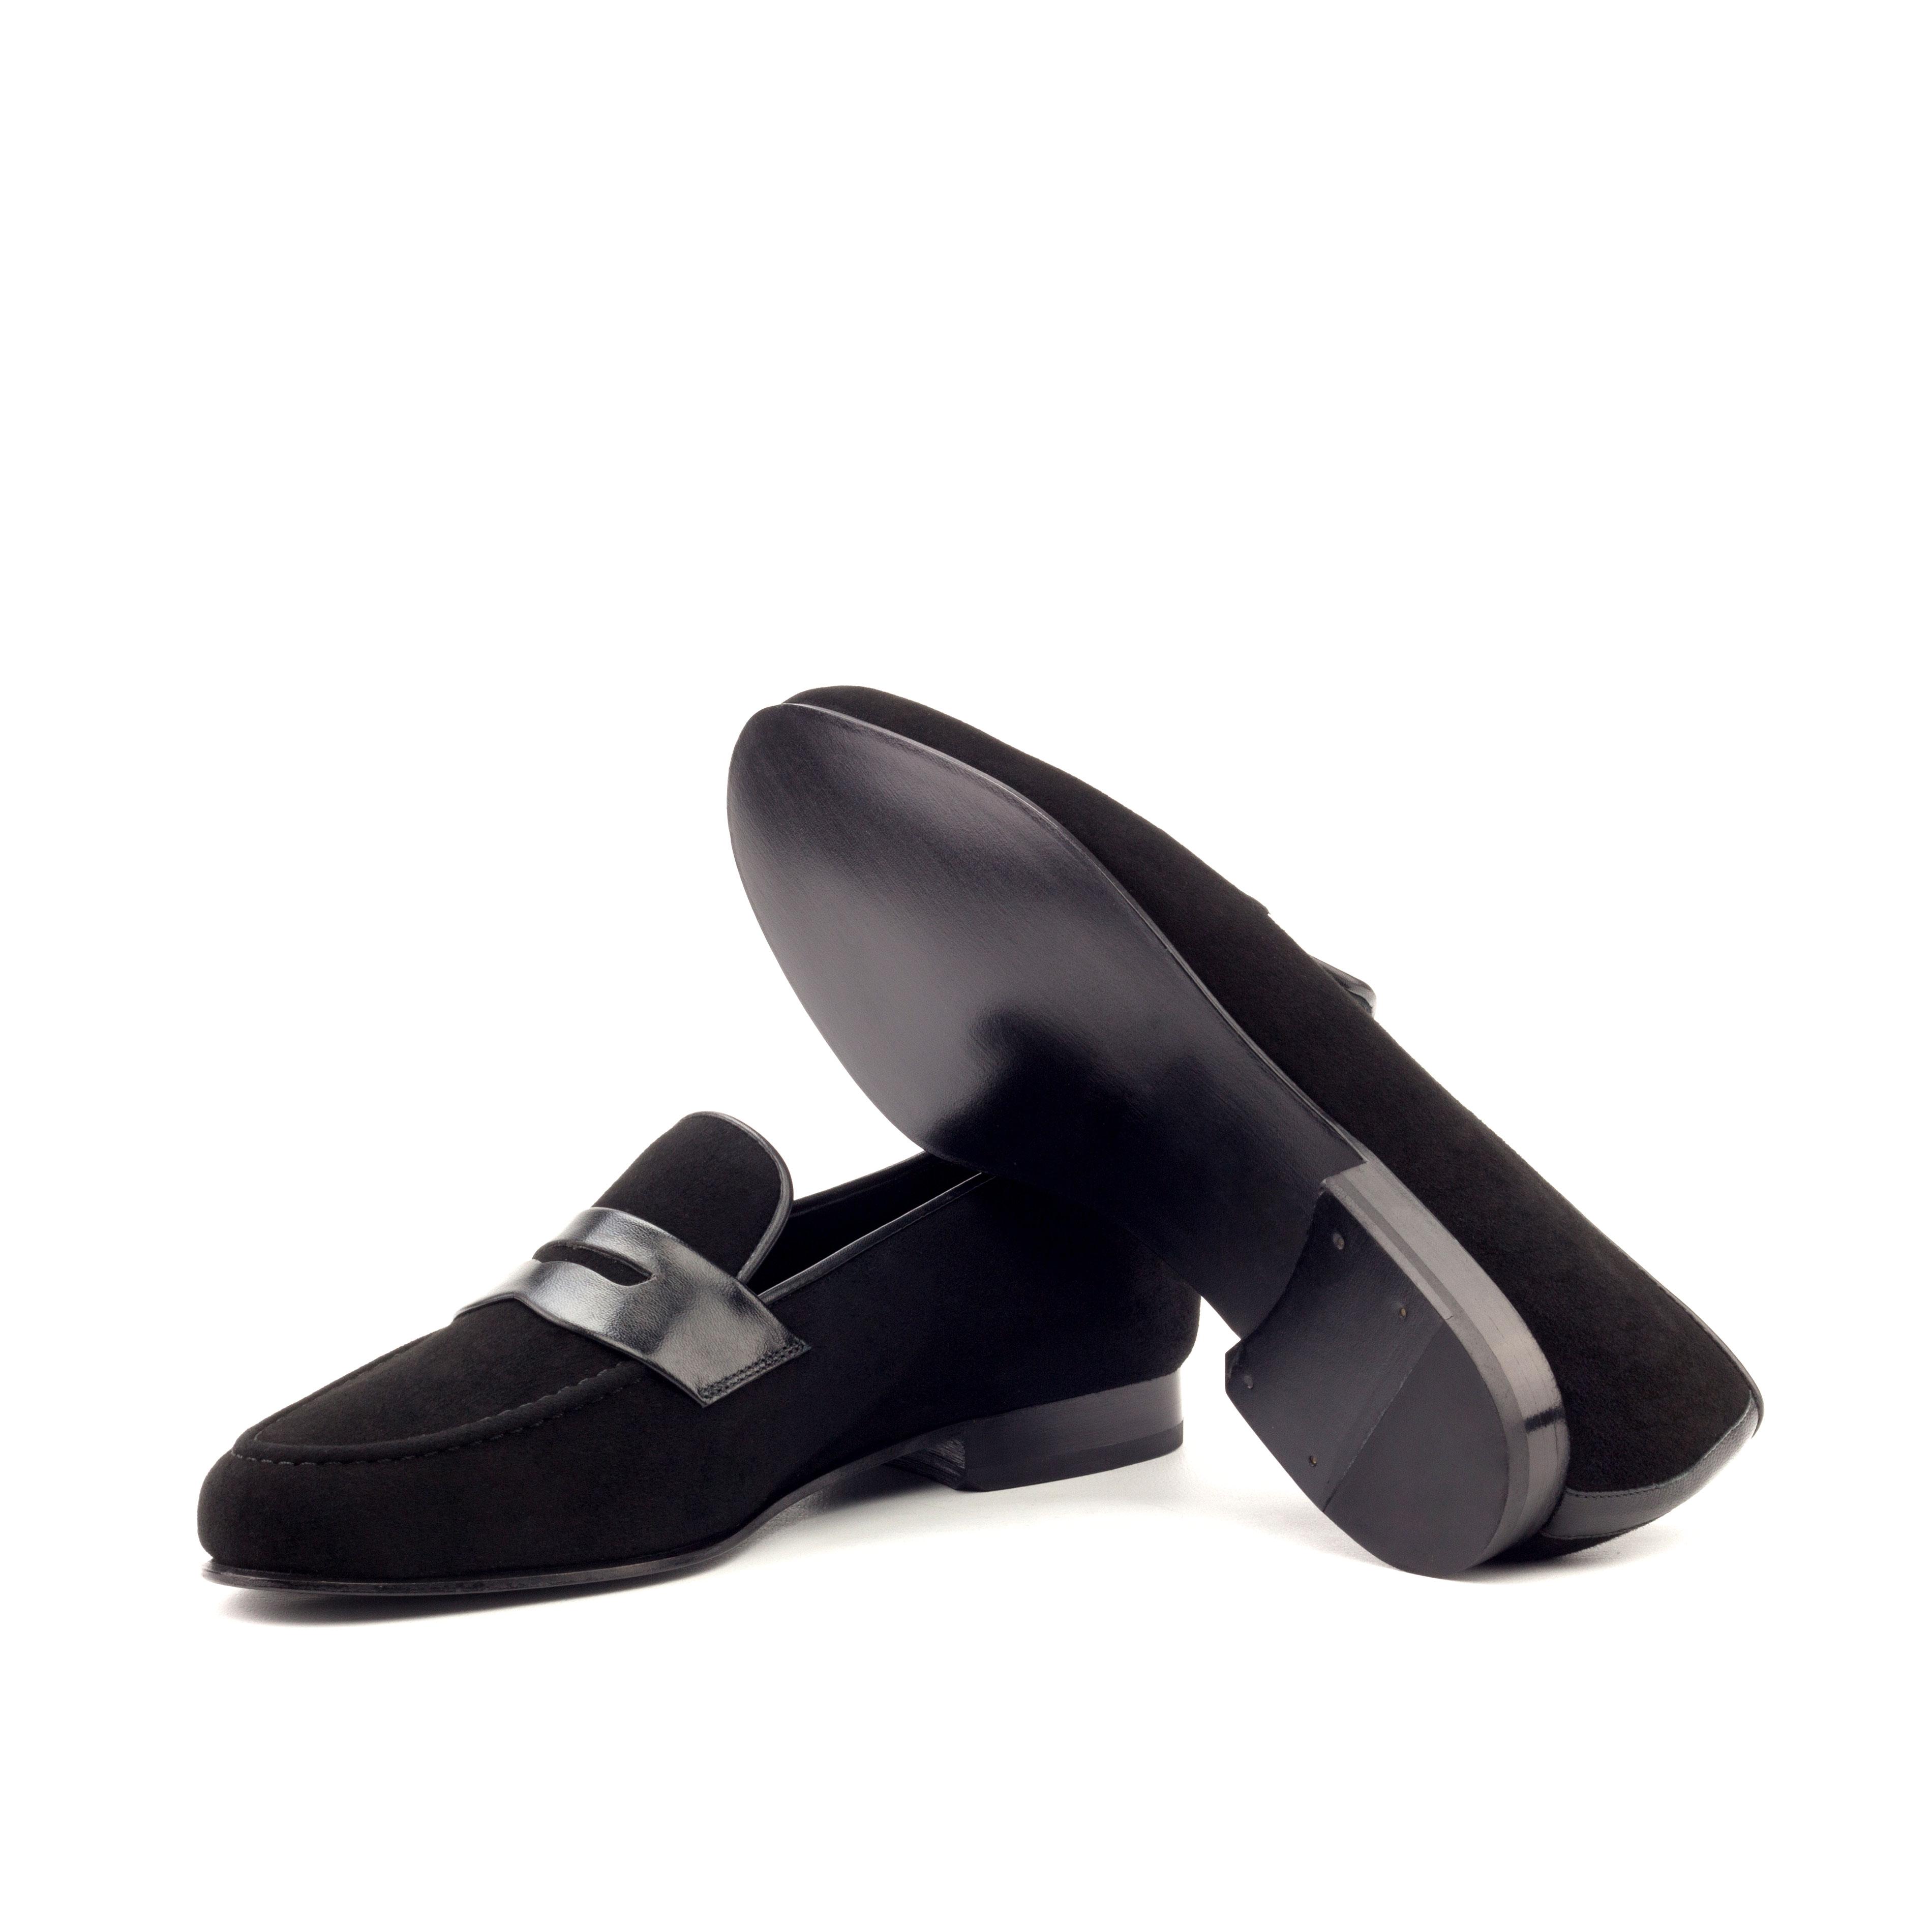 Wellington Albert Mask – Black Suede-Black Leather-Ang9